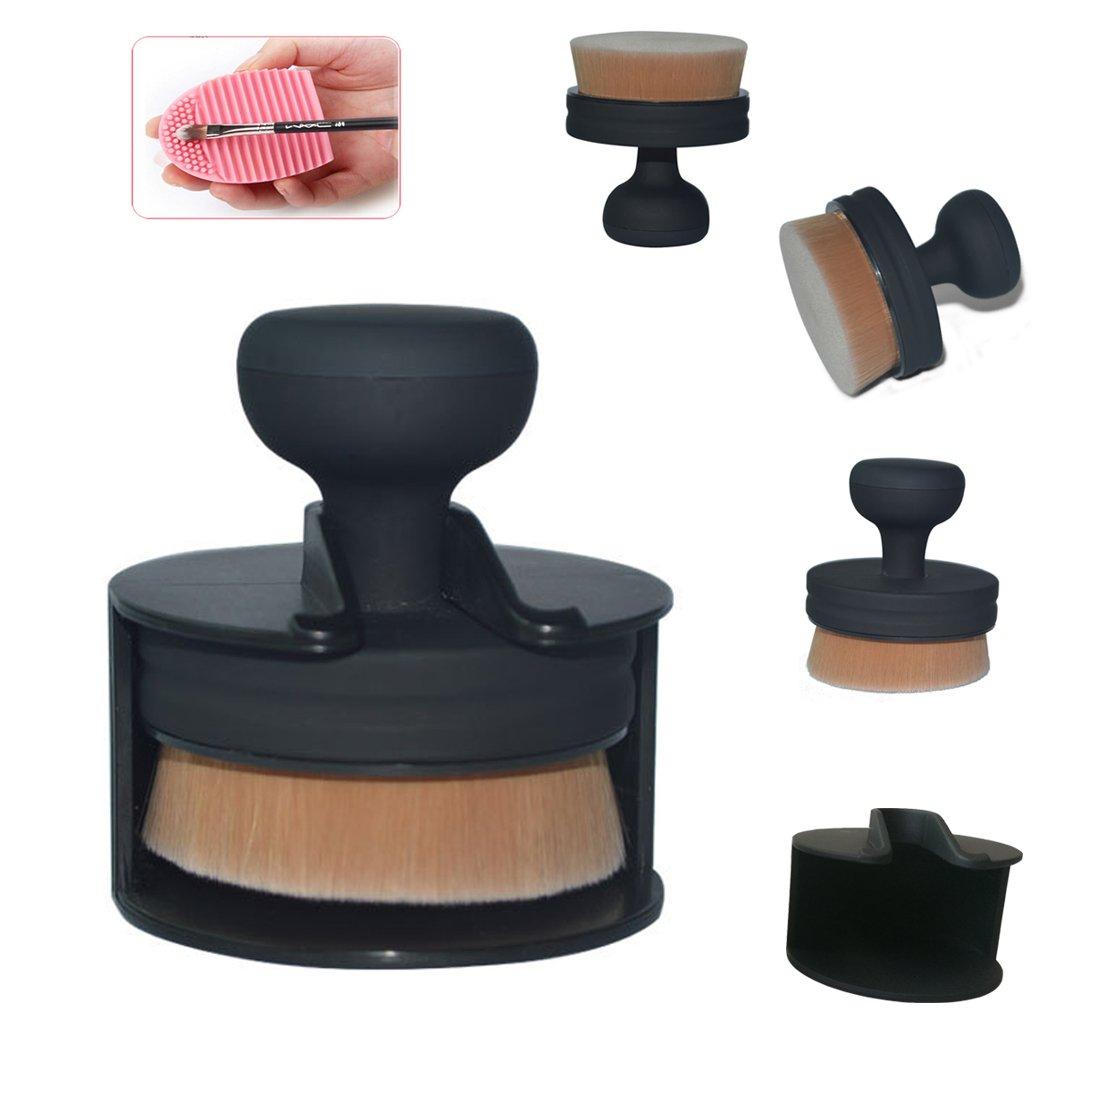 Lookathot Circle Flat Foundation Cheap bargain Makeup New Shipping Free Shipping Brush- Liquid Founda for